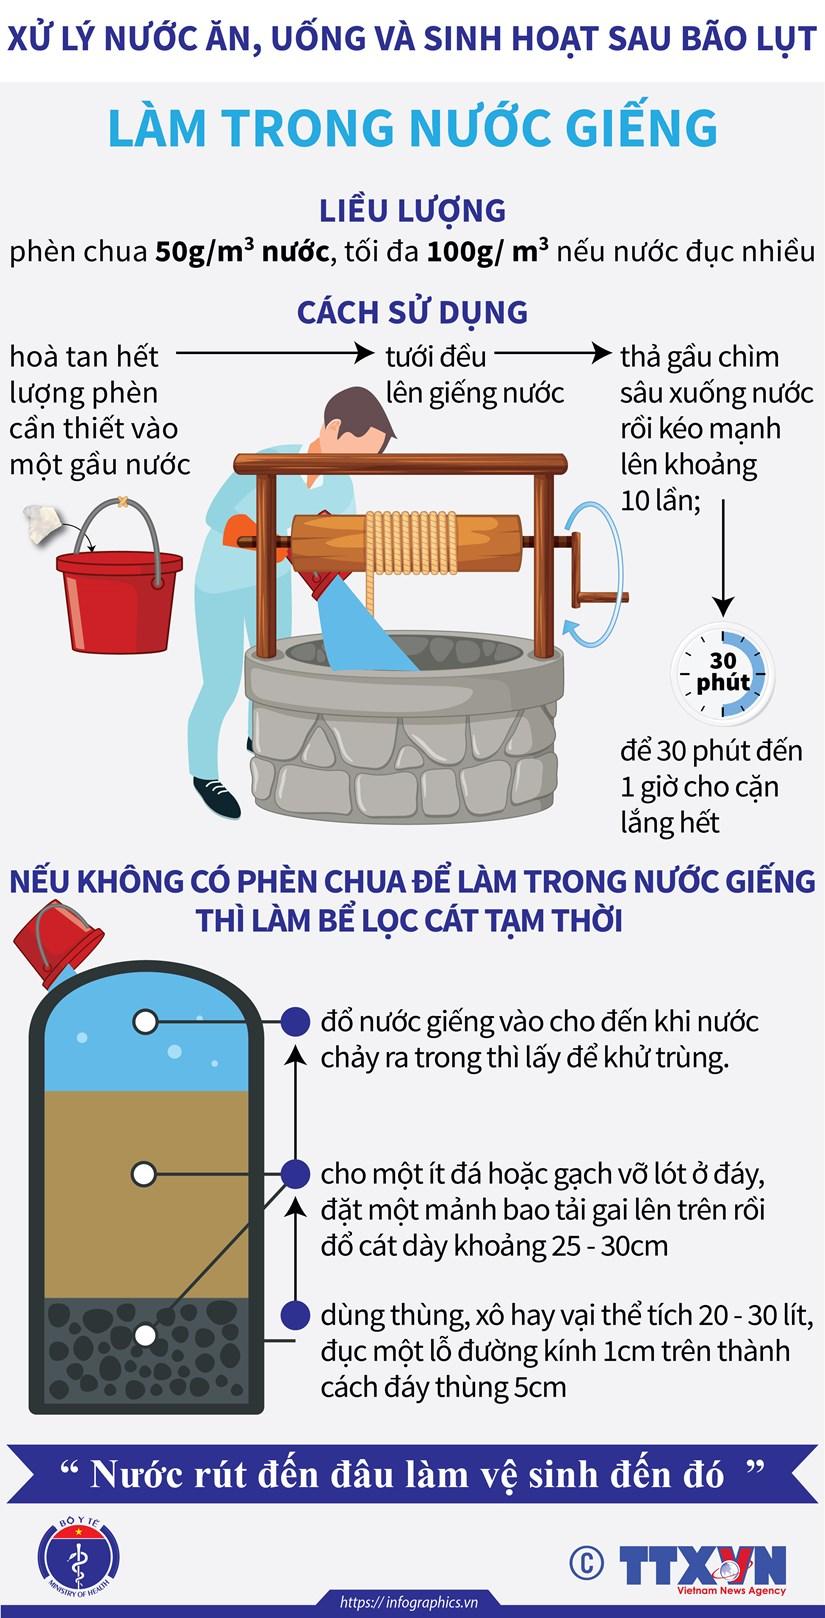 [Infographics] Xu ly nuoc an, uong va sinh hoat sau bao lut hinh anh 3